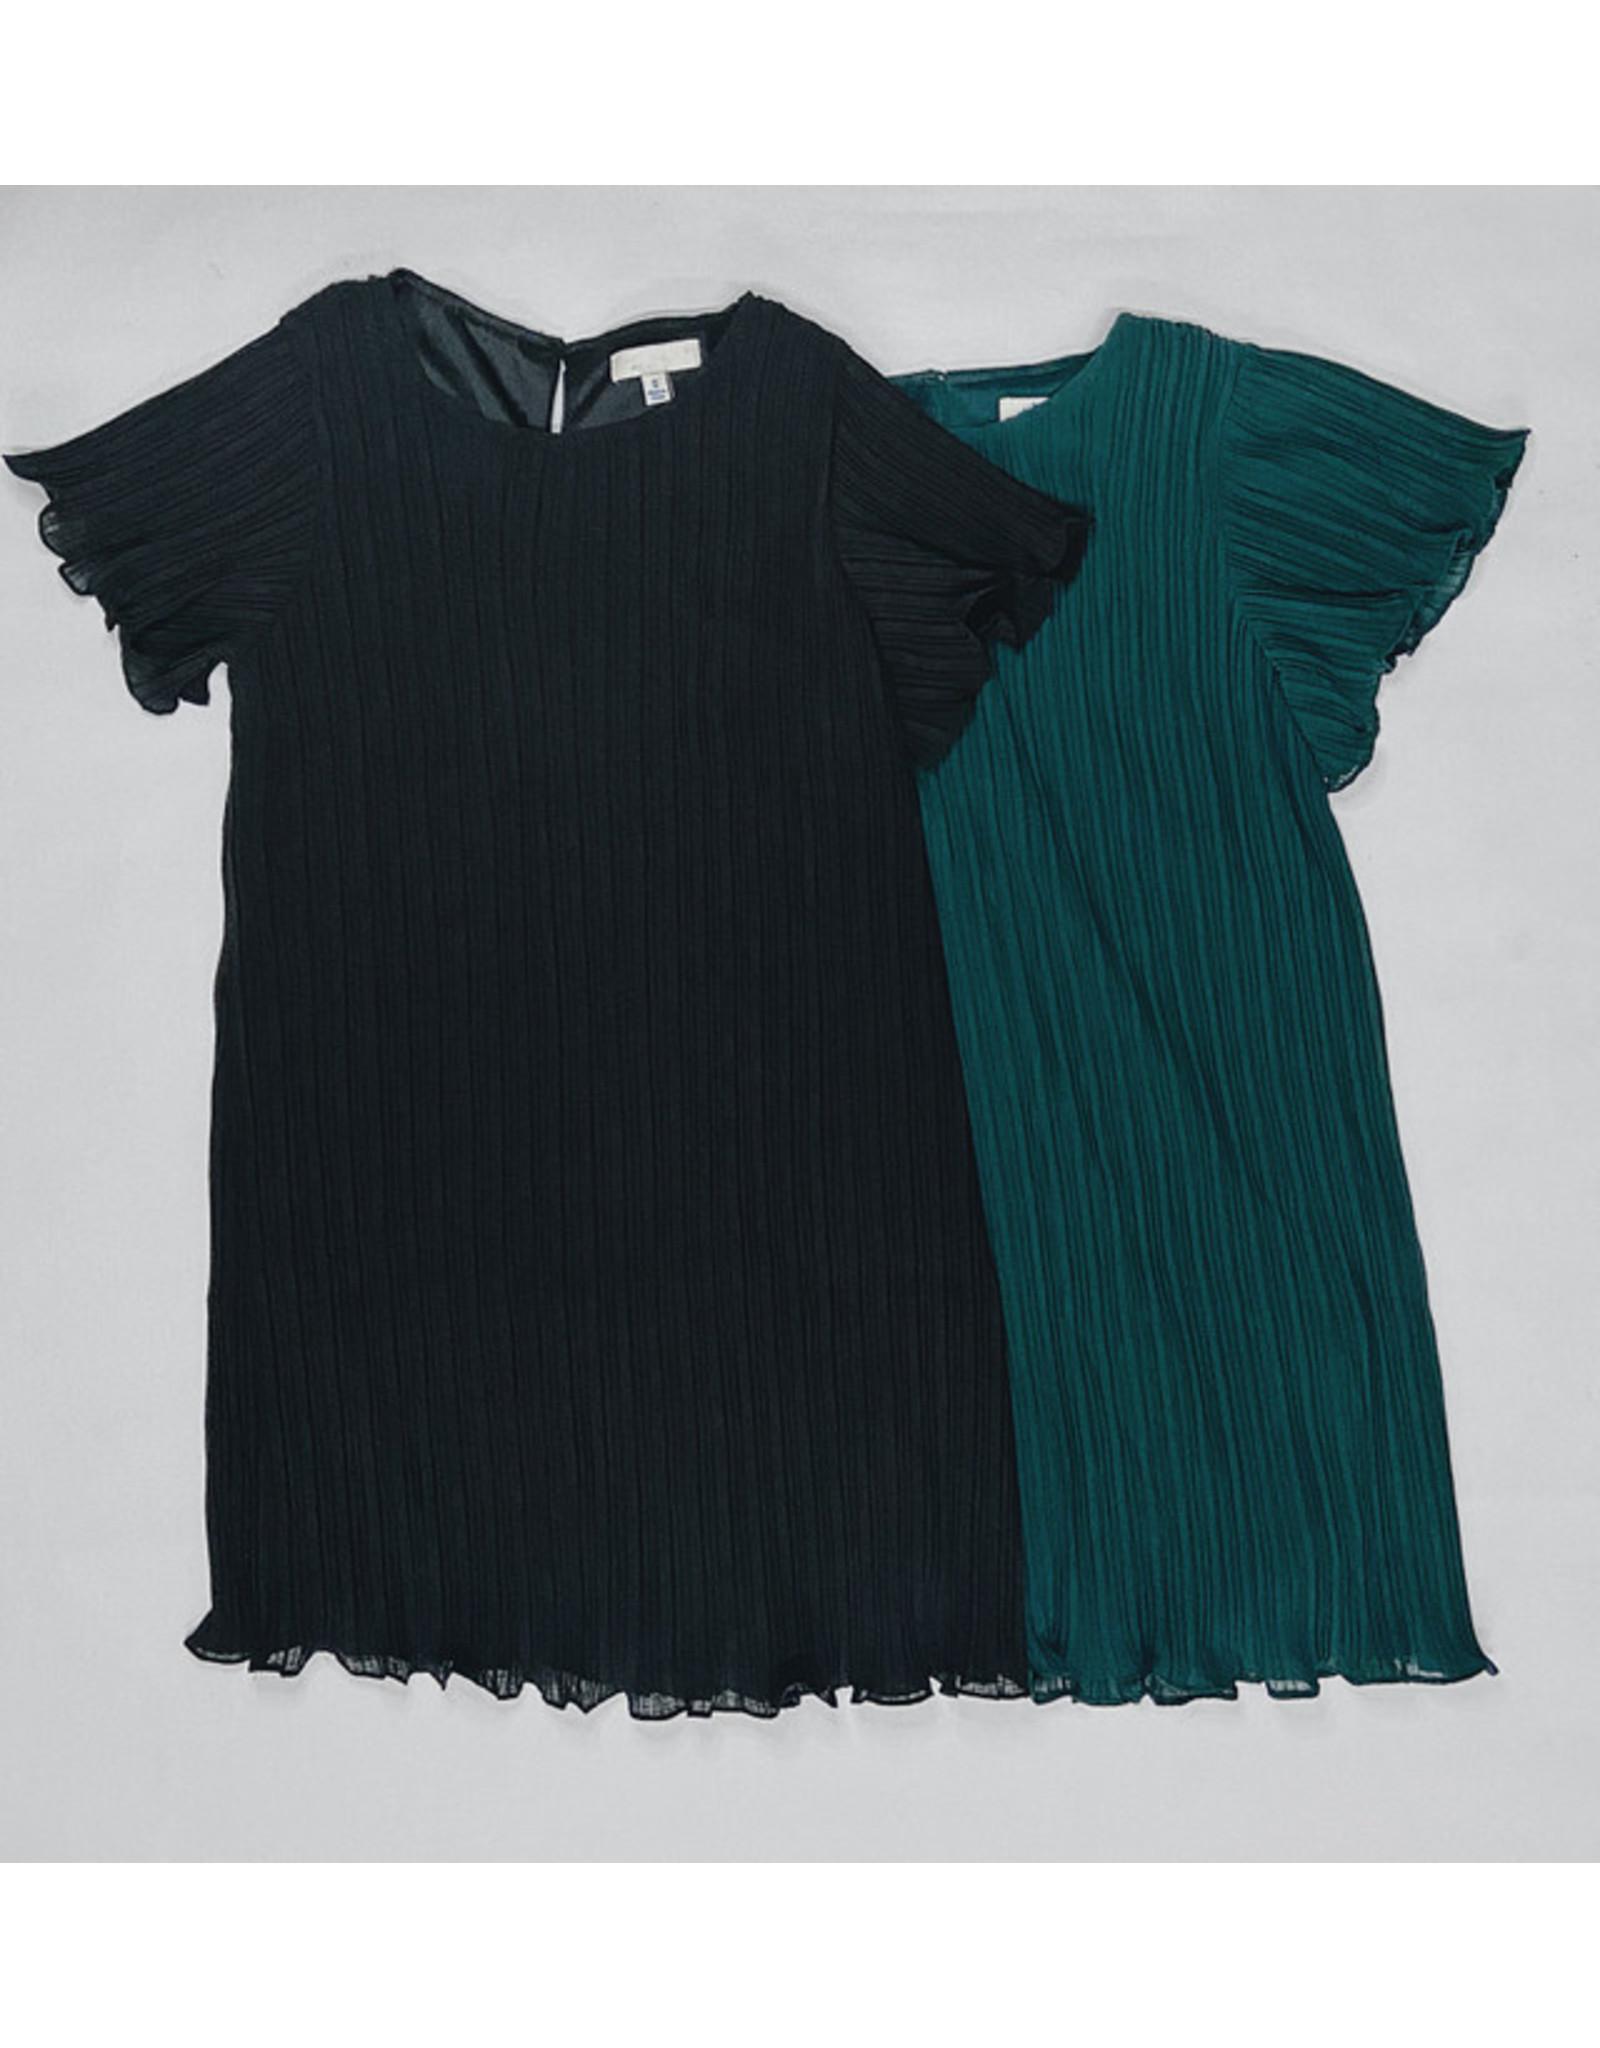 TAHSIN PLEATED DRESS